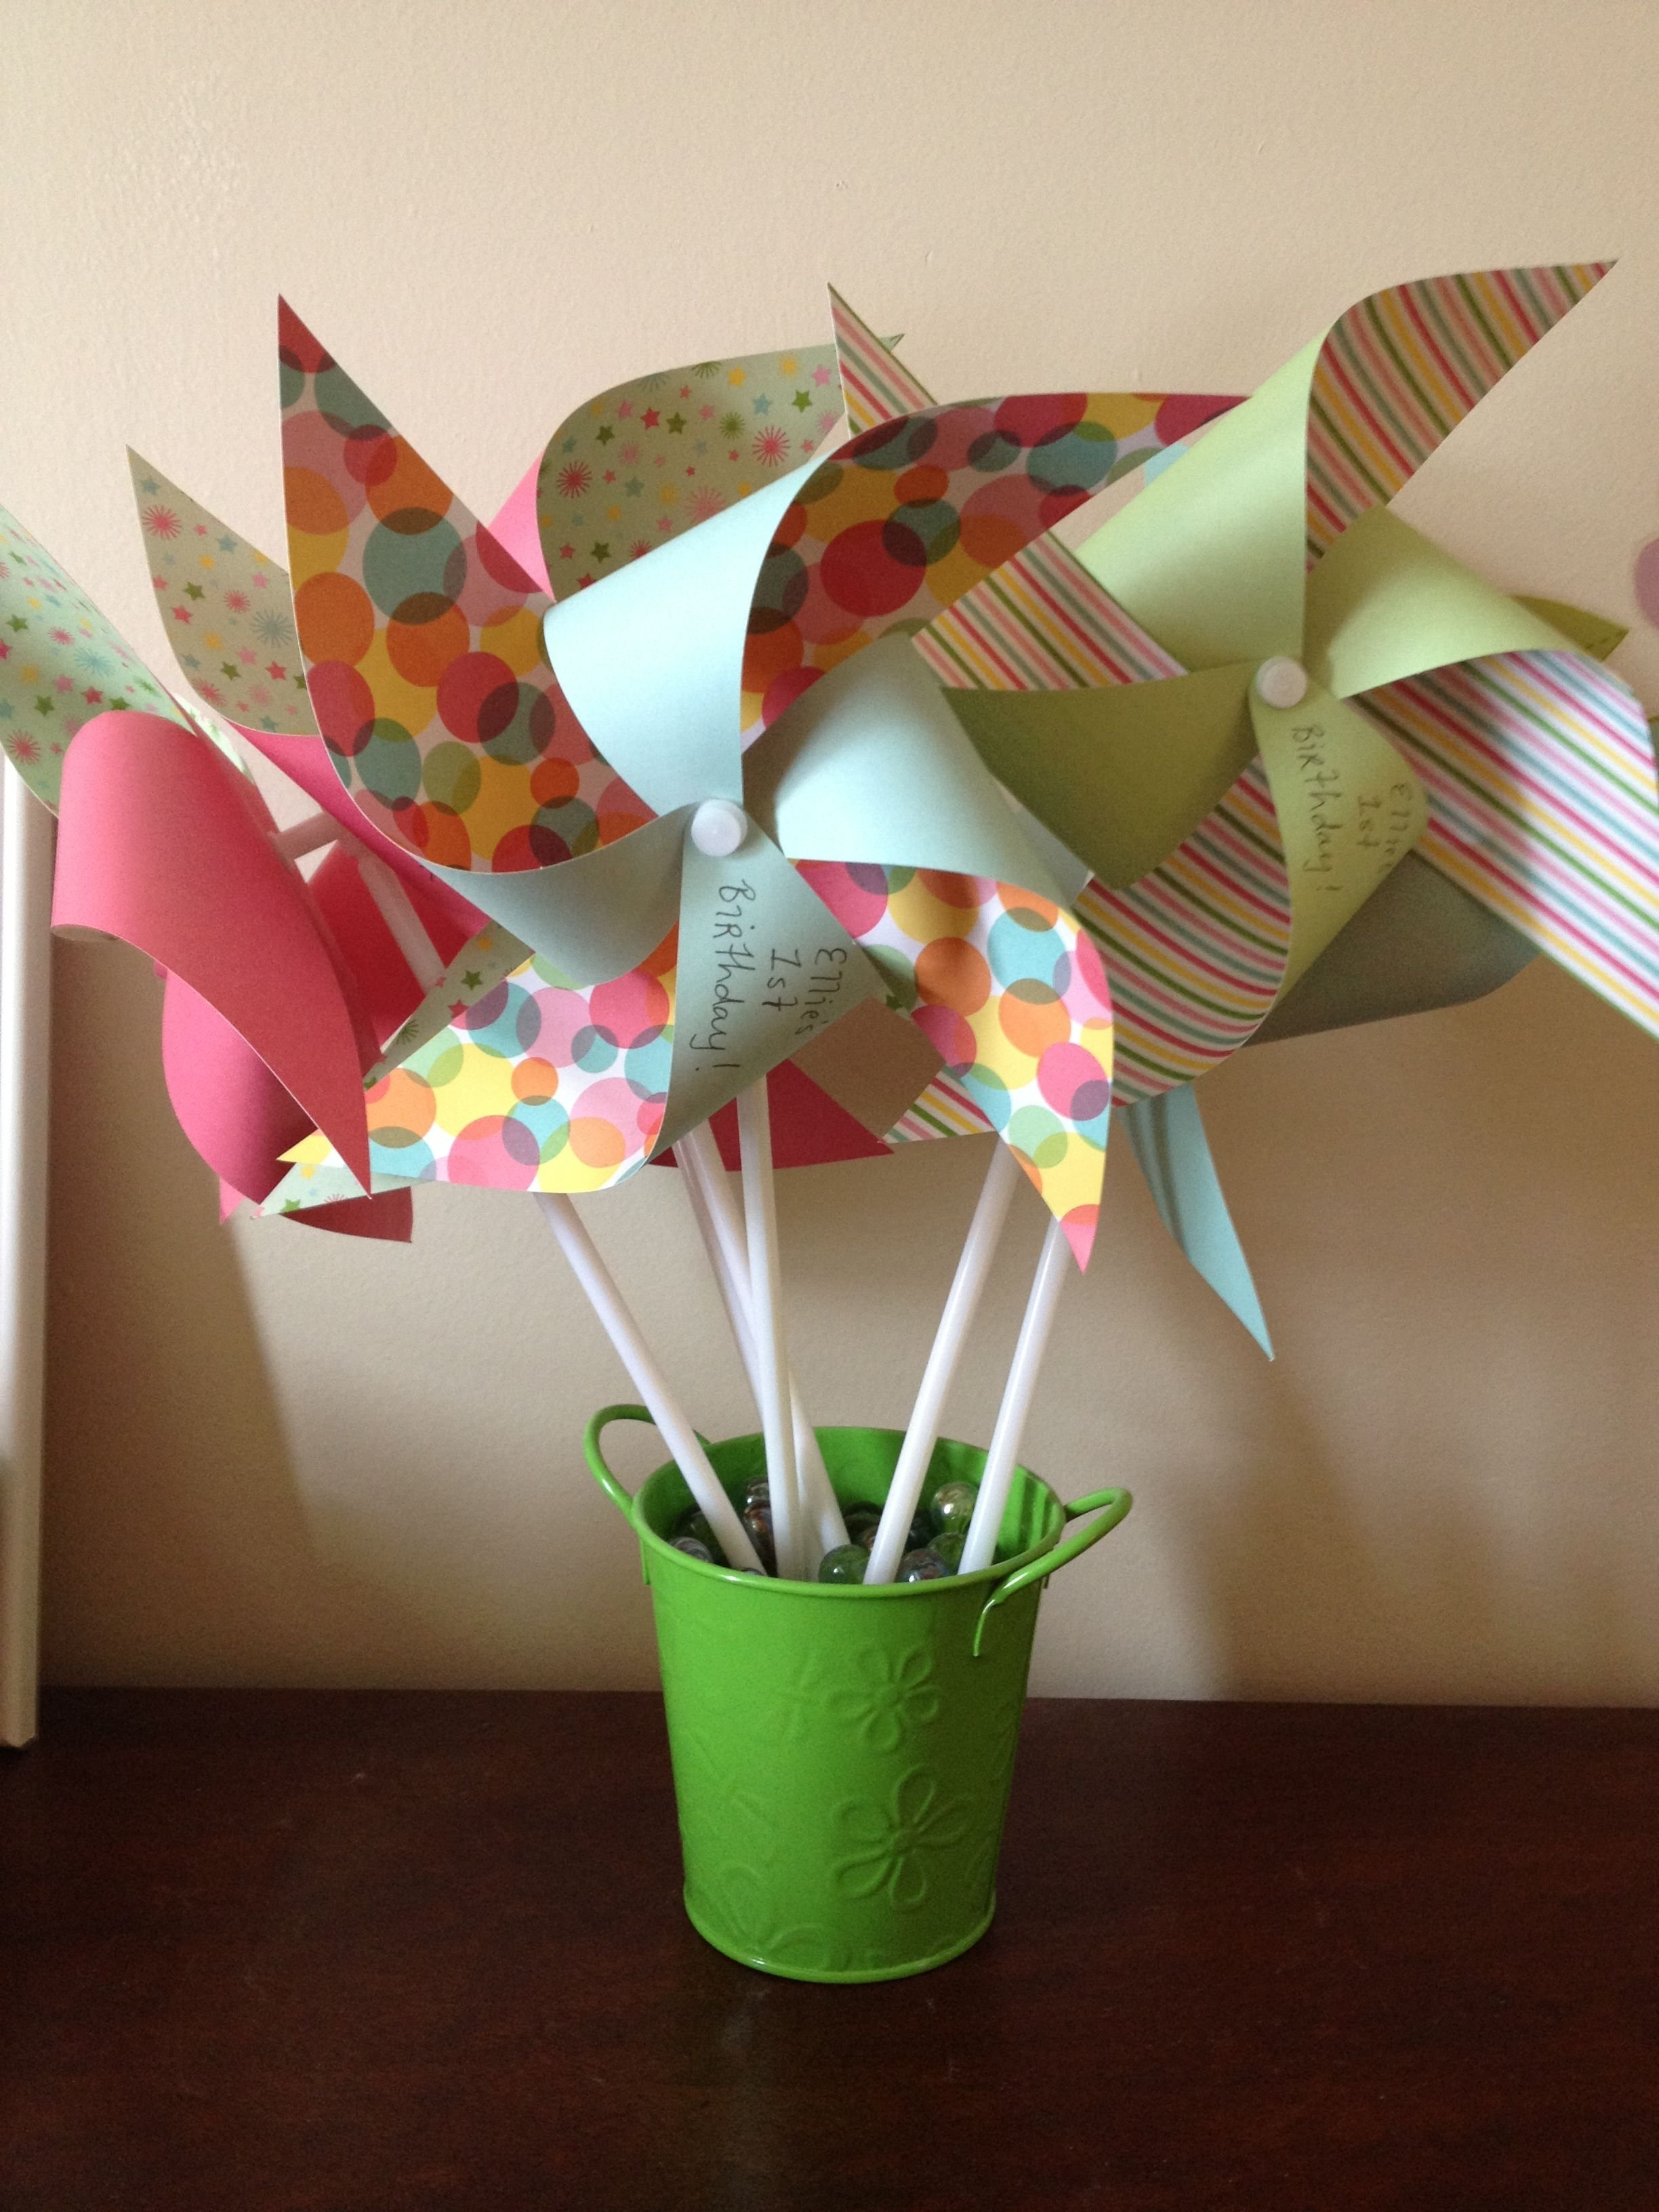 10 Awesome First Birthday Ideas Martha Stewart first birthday center piece used martha stewart pinwheel kit 2021